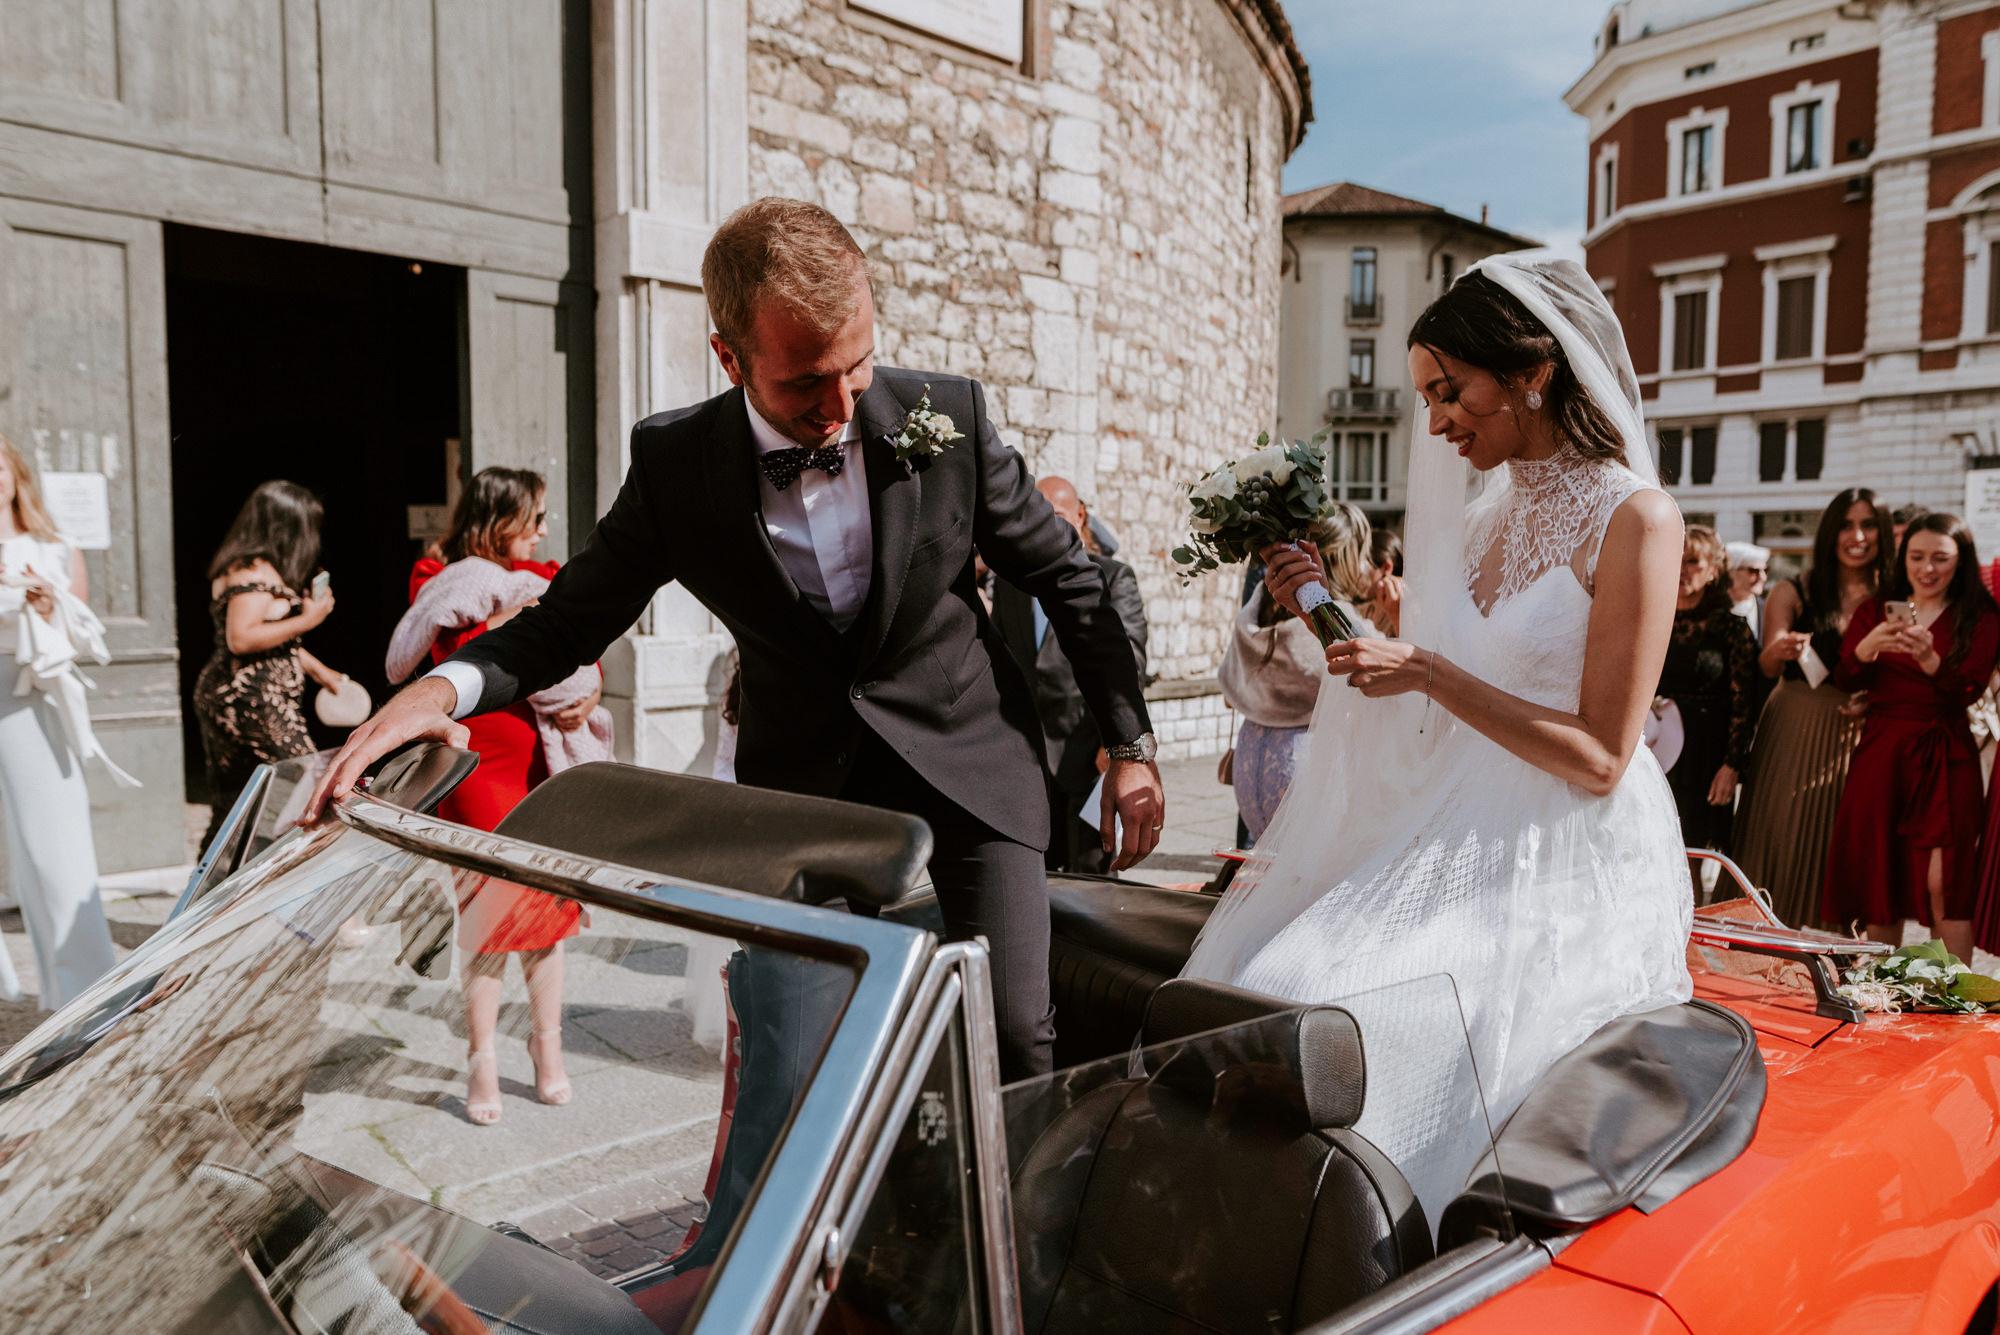 FOTO+PHOTO+BODA+WEDDING+ITALIA+ITALY+MAURICIO+GARAY+MAURICIOGARAY+WEDDINPHOTOGRAPHER+FOTOGRAFODEBODA-1076.jpg